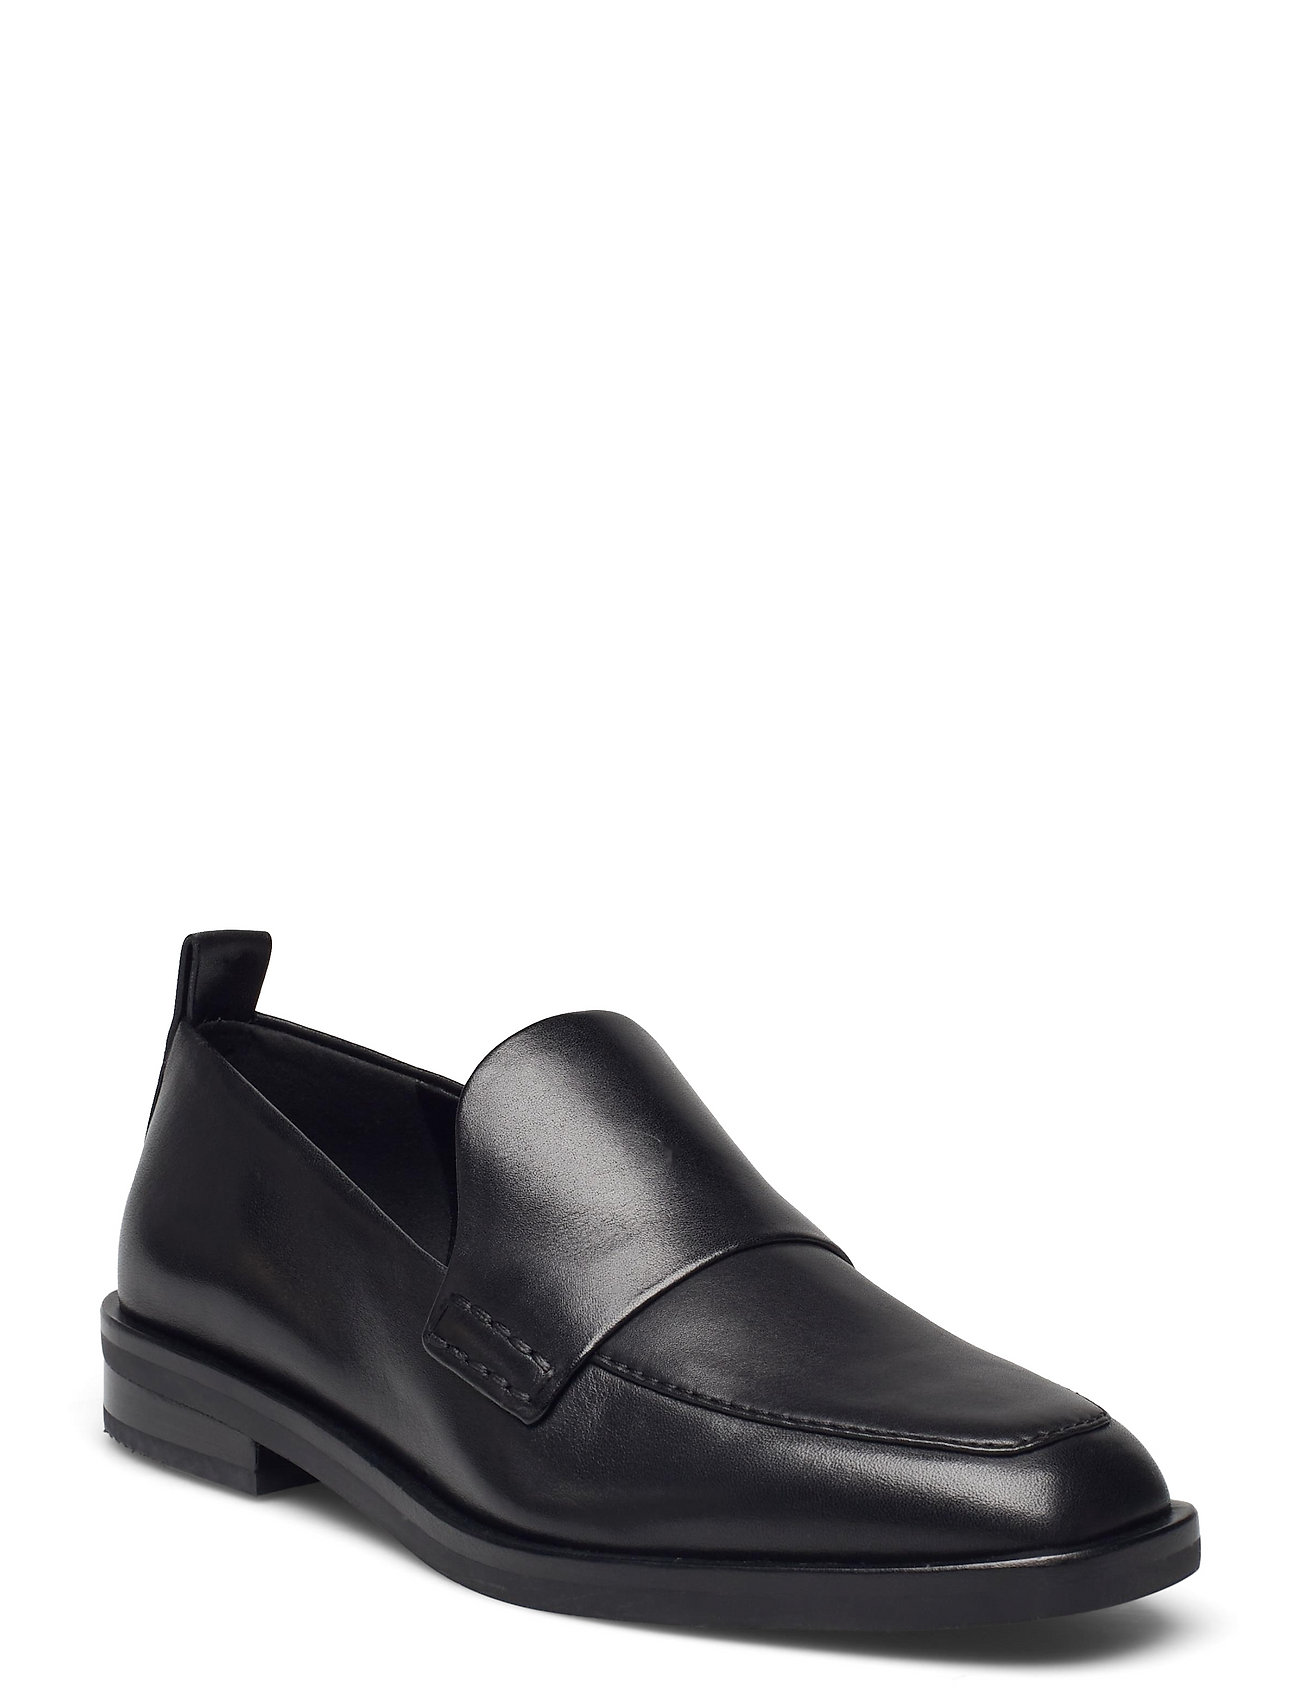 Shp9-T603sen / Alexa - 25mm Loafer Loafers Flade Sko Sort 3.1 Phillip Lim